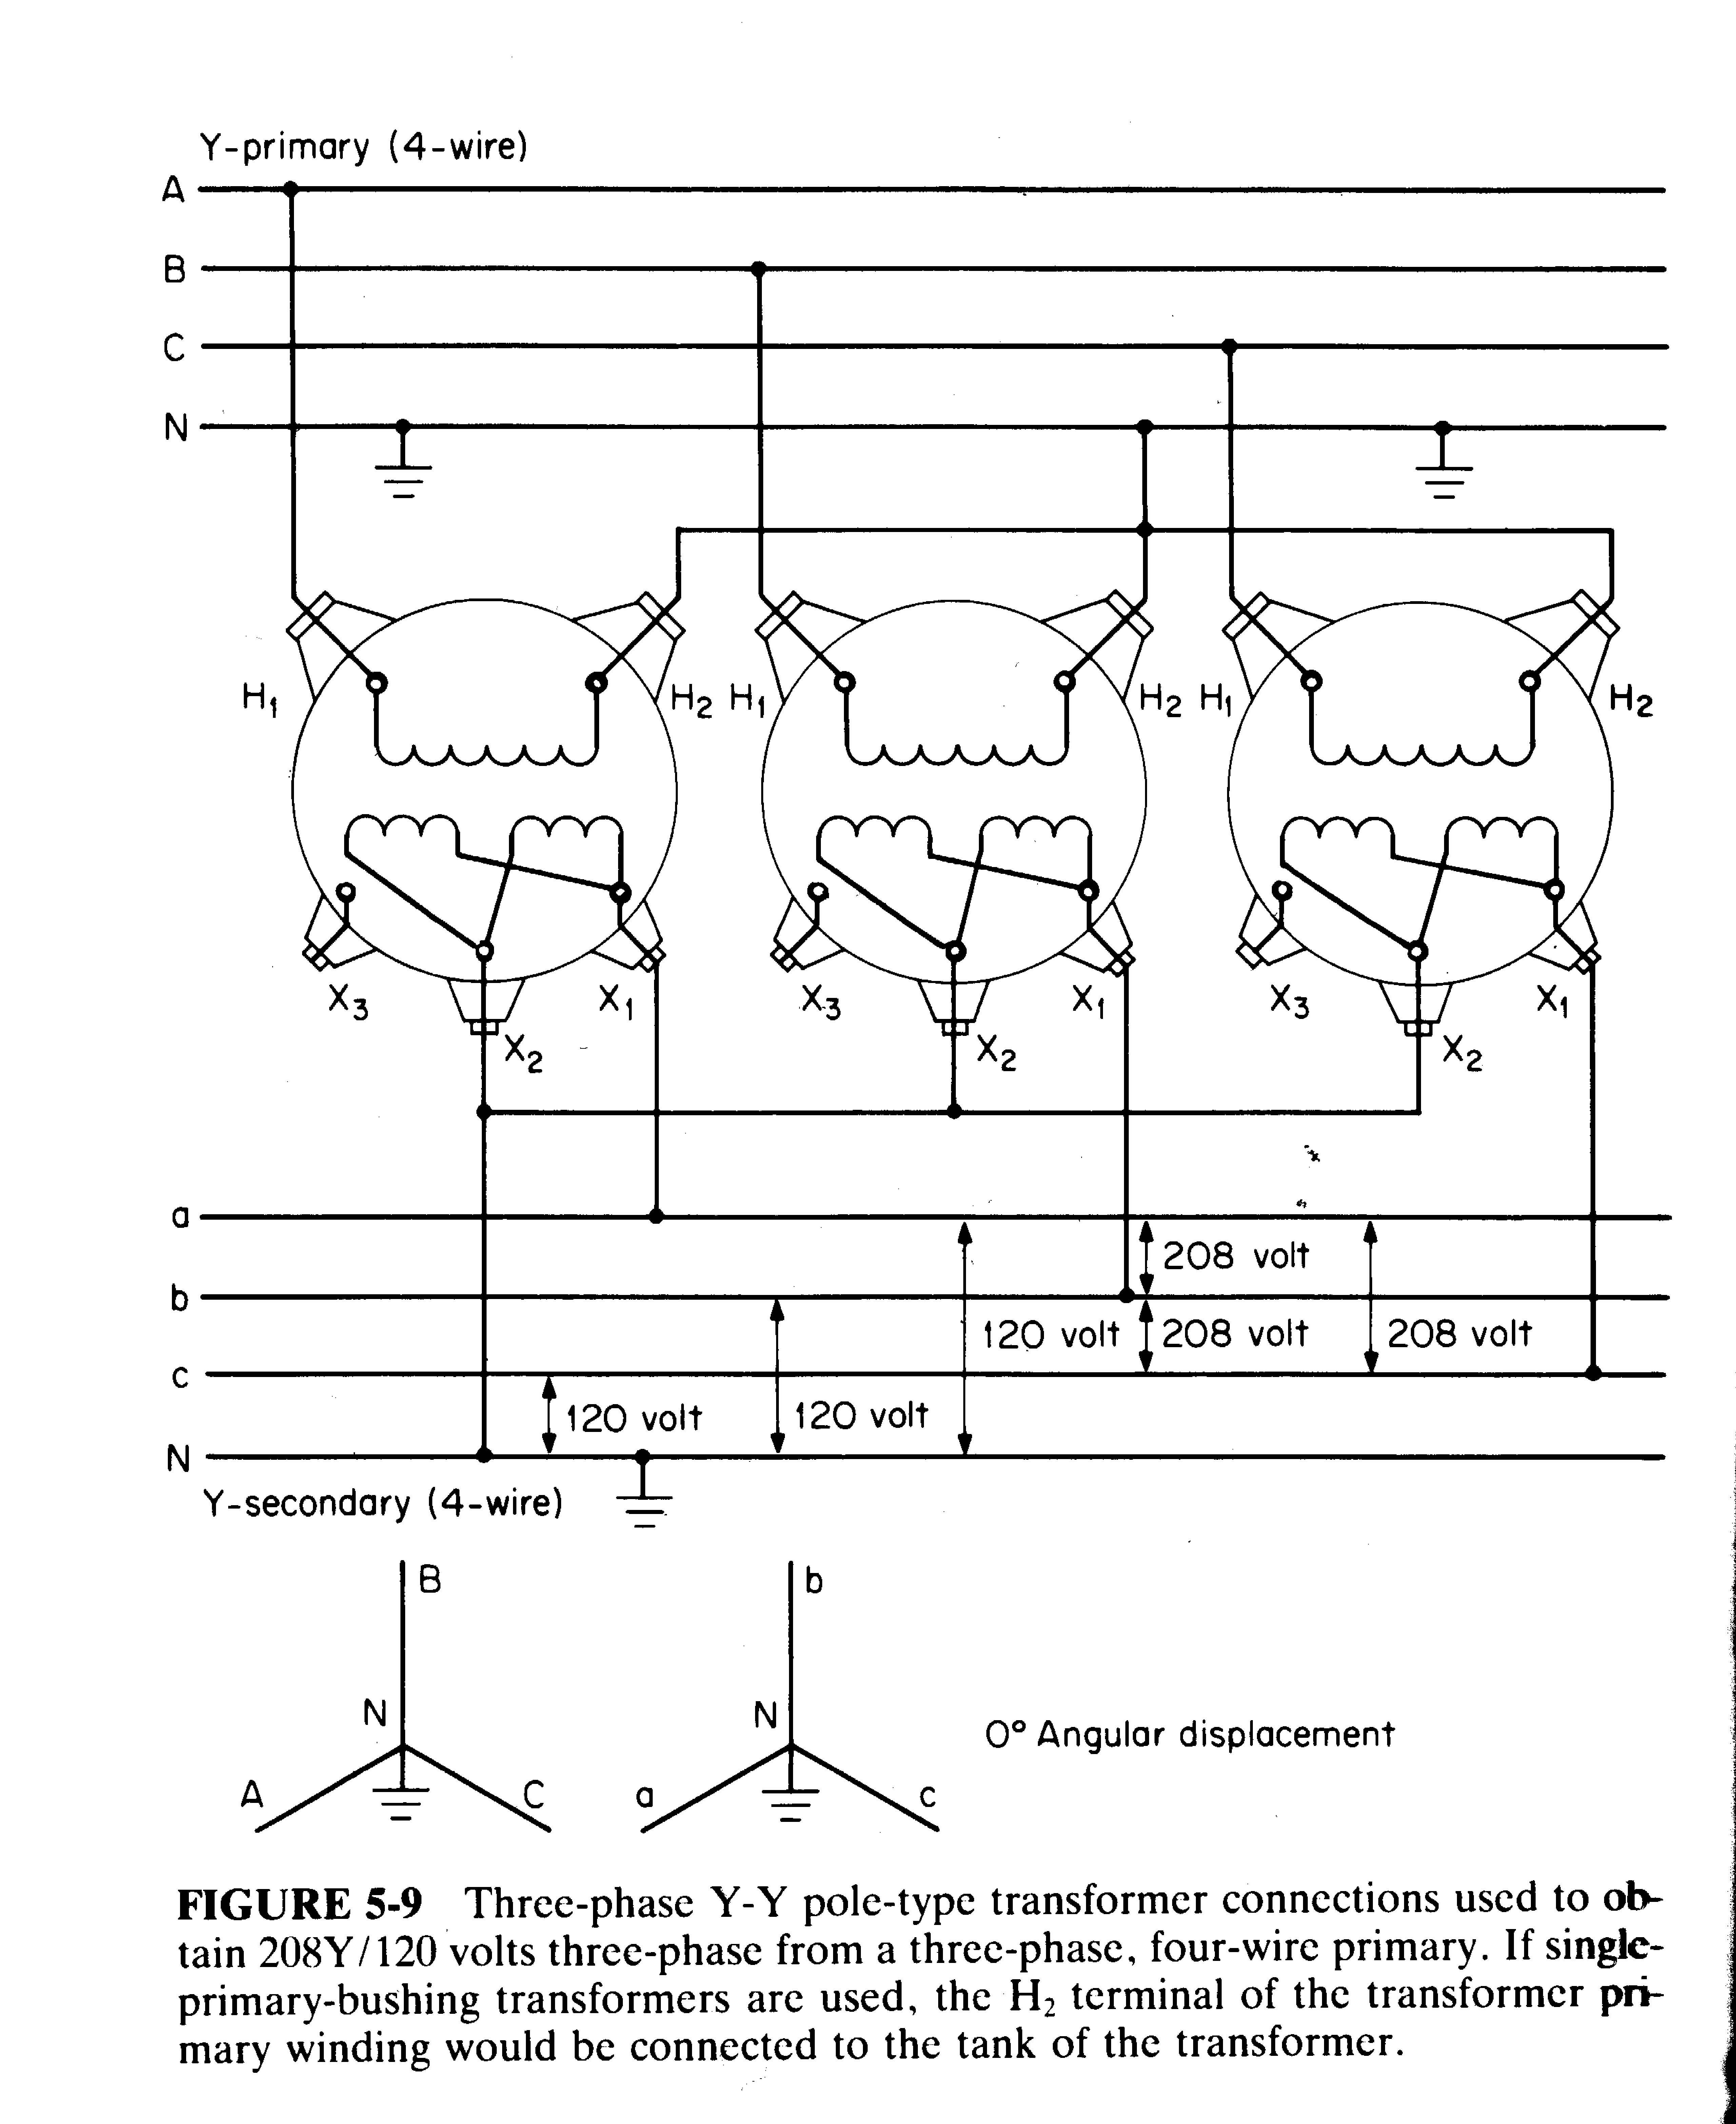 480v Transformer Wiring Diagram - Wiring Diagram Data on single phase transformer diagram, 3 phase wiring schematic, 3 phase 480v distribution panel, 3 phase pad-mounted transformer, 3 phase wye wiring, 3 phase voltage, 3 phase power metering 2 transformer, current transformer diagram, transformer vector group diagram, step up transformer diagram, 3 phase transformer formulas, auto transformer diagram, 3 phase step down transformer, 3 phase angle meter, 3 phase y diagram, power pole transformer diagram, 3 phase power diagram, ct transformer connection diagram, electrical transformer diagram, 3 phase phasor diagram,